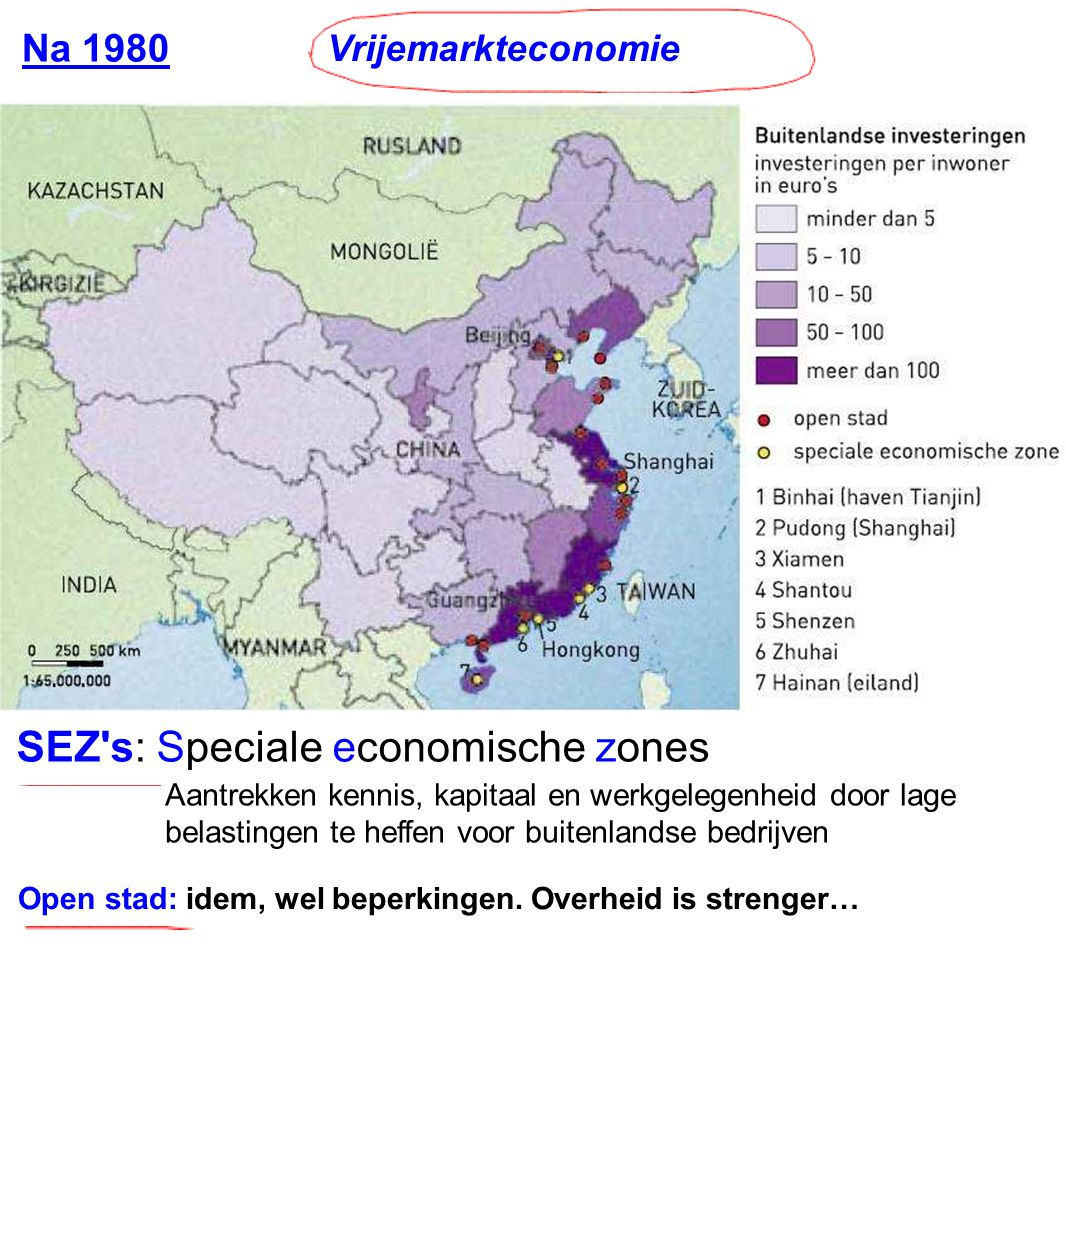 SEZ s: Speciale economische zones